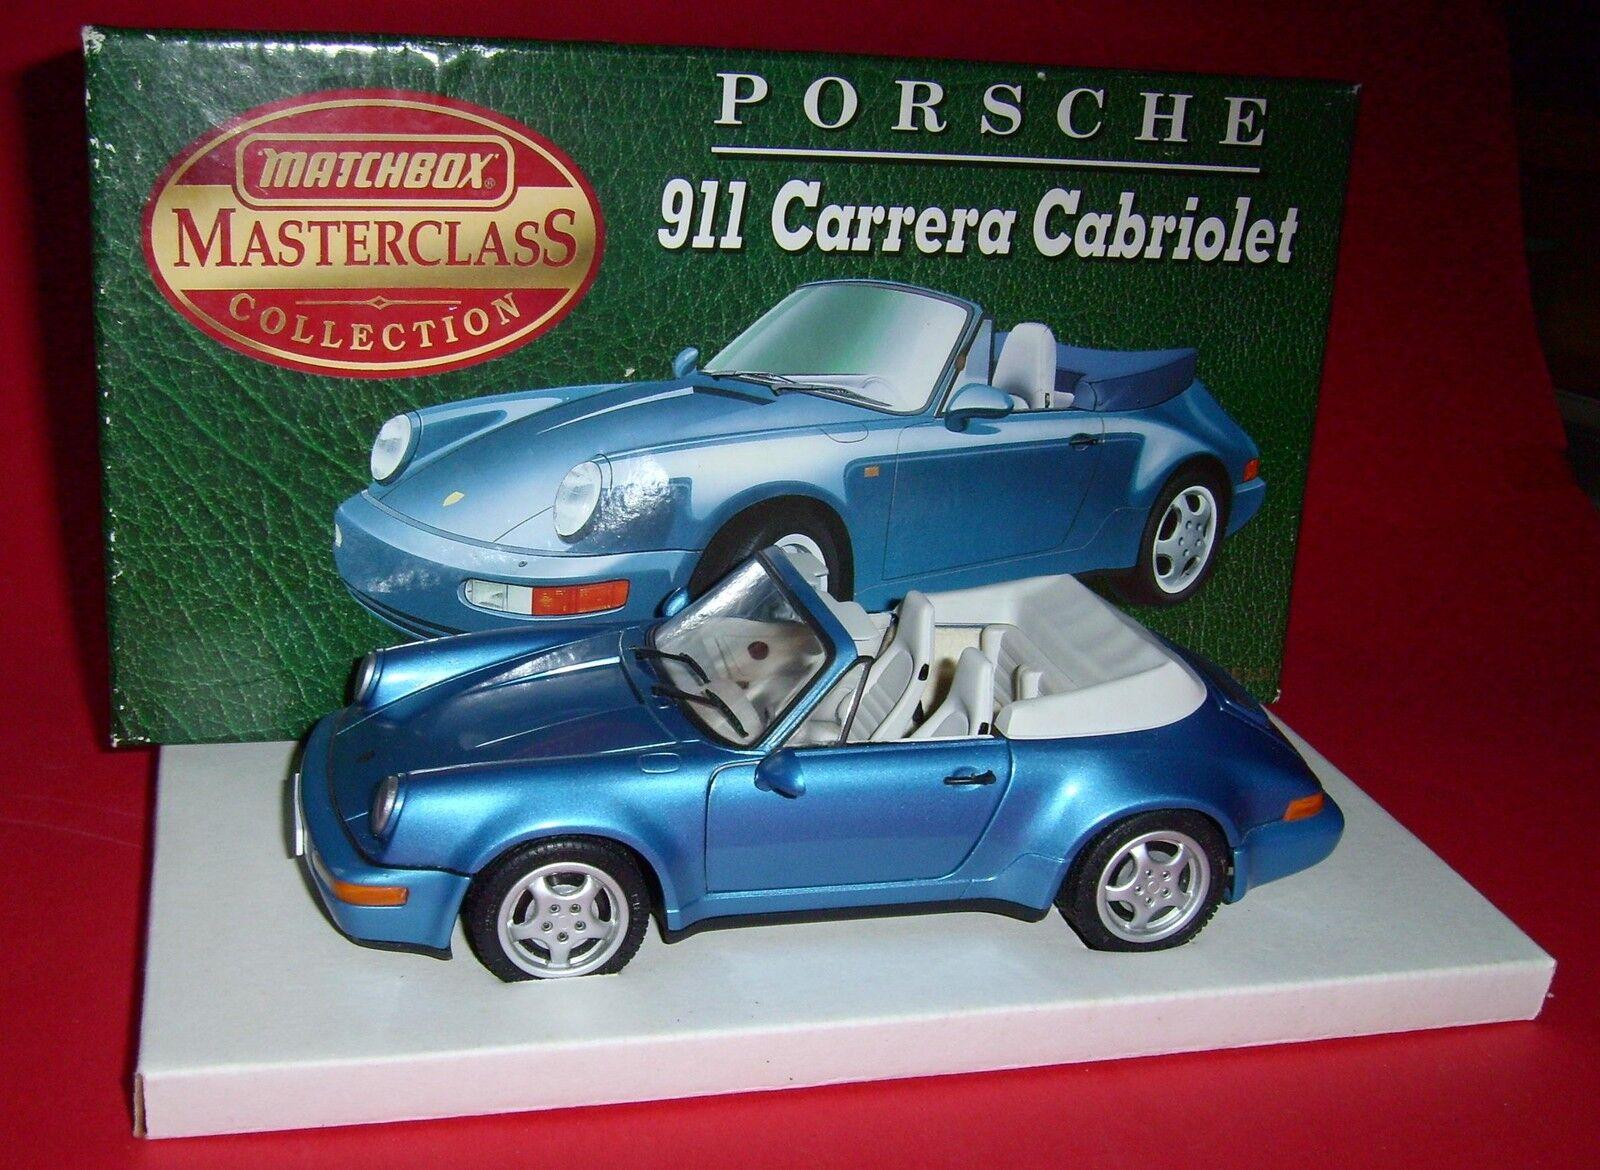 Matchbox 1 24 Masterclass Collection Porsche 911 Carrera Cabriolet OVP  | Lebendige Form